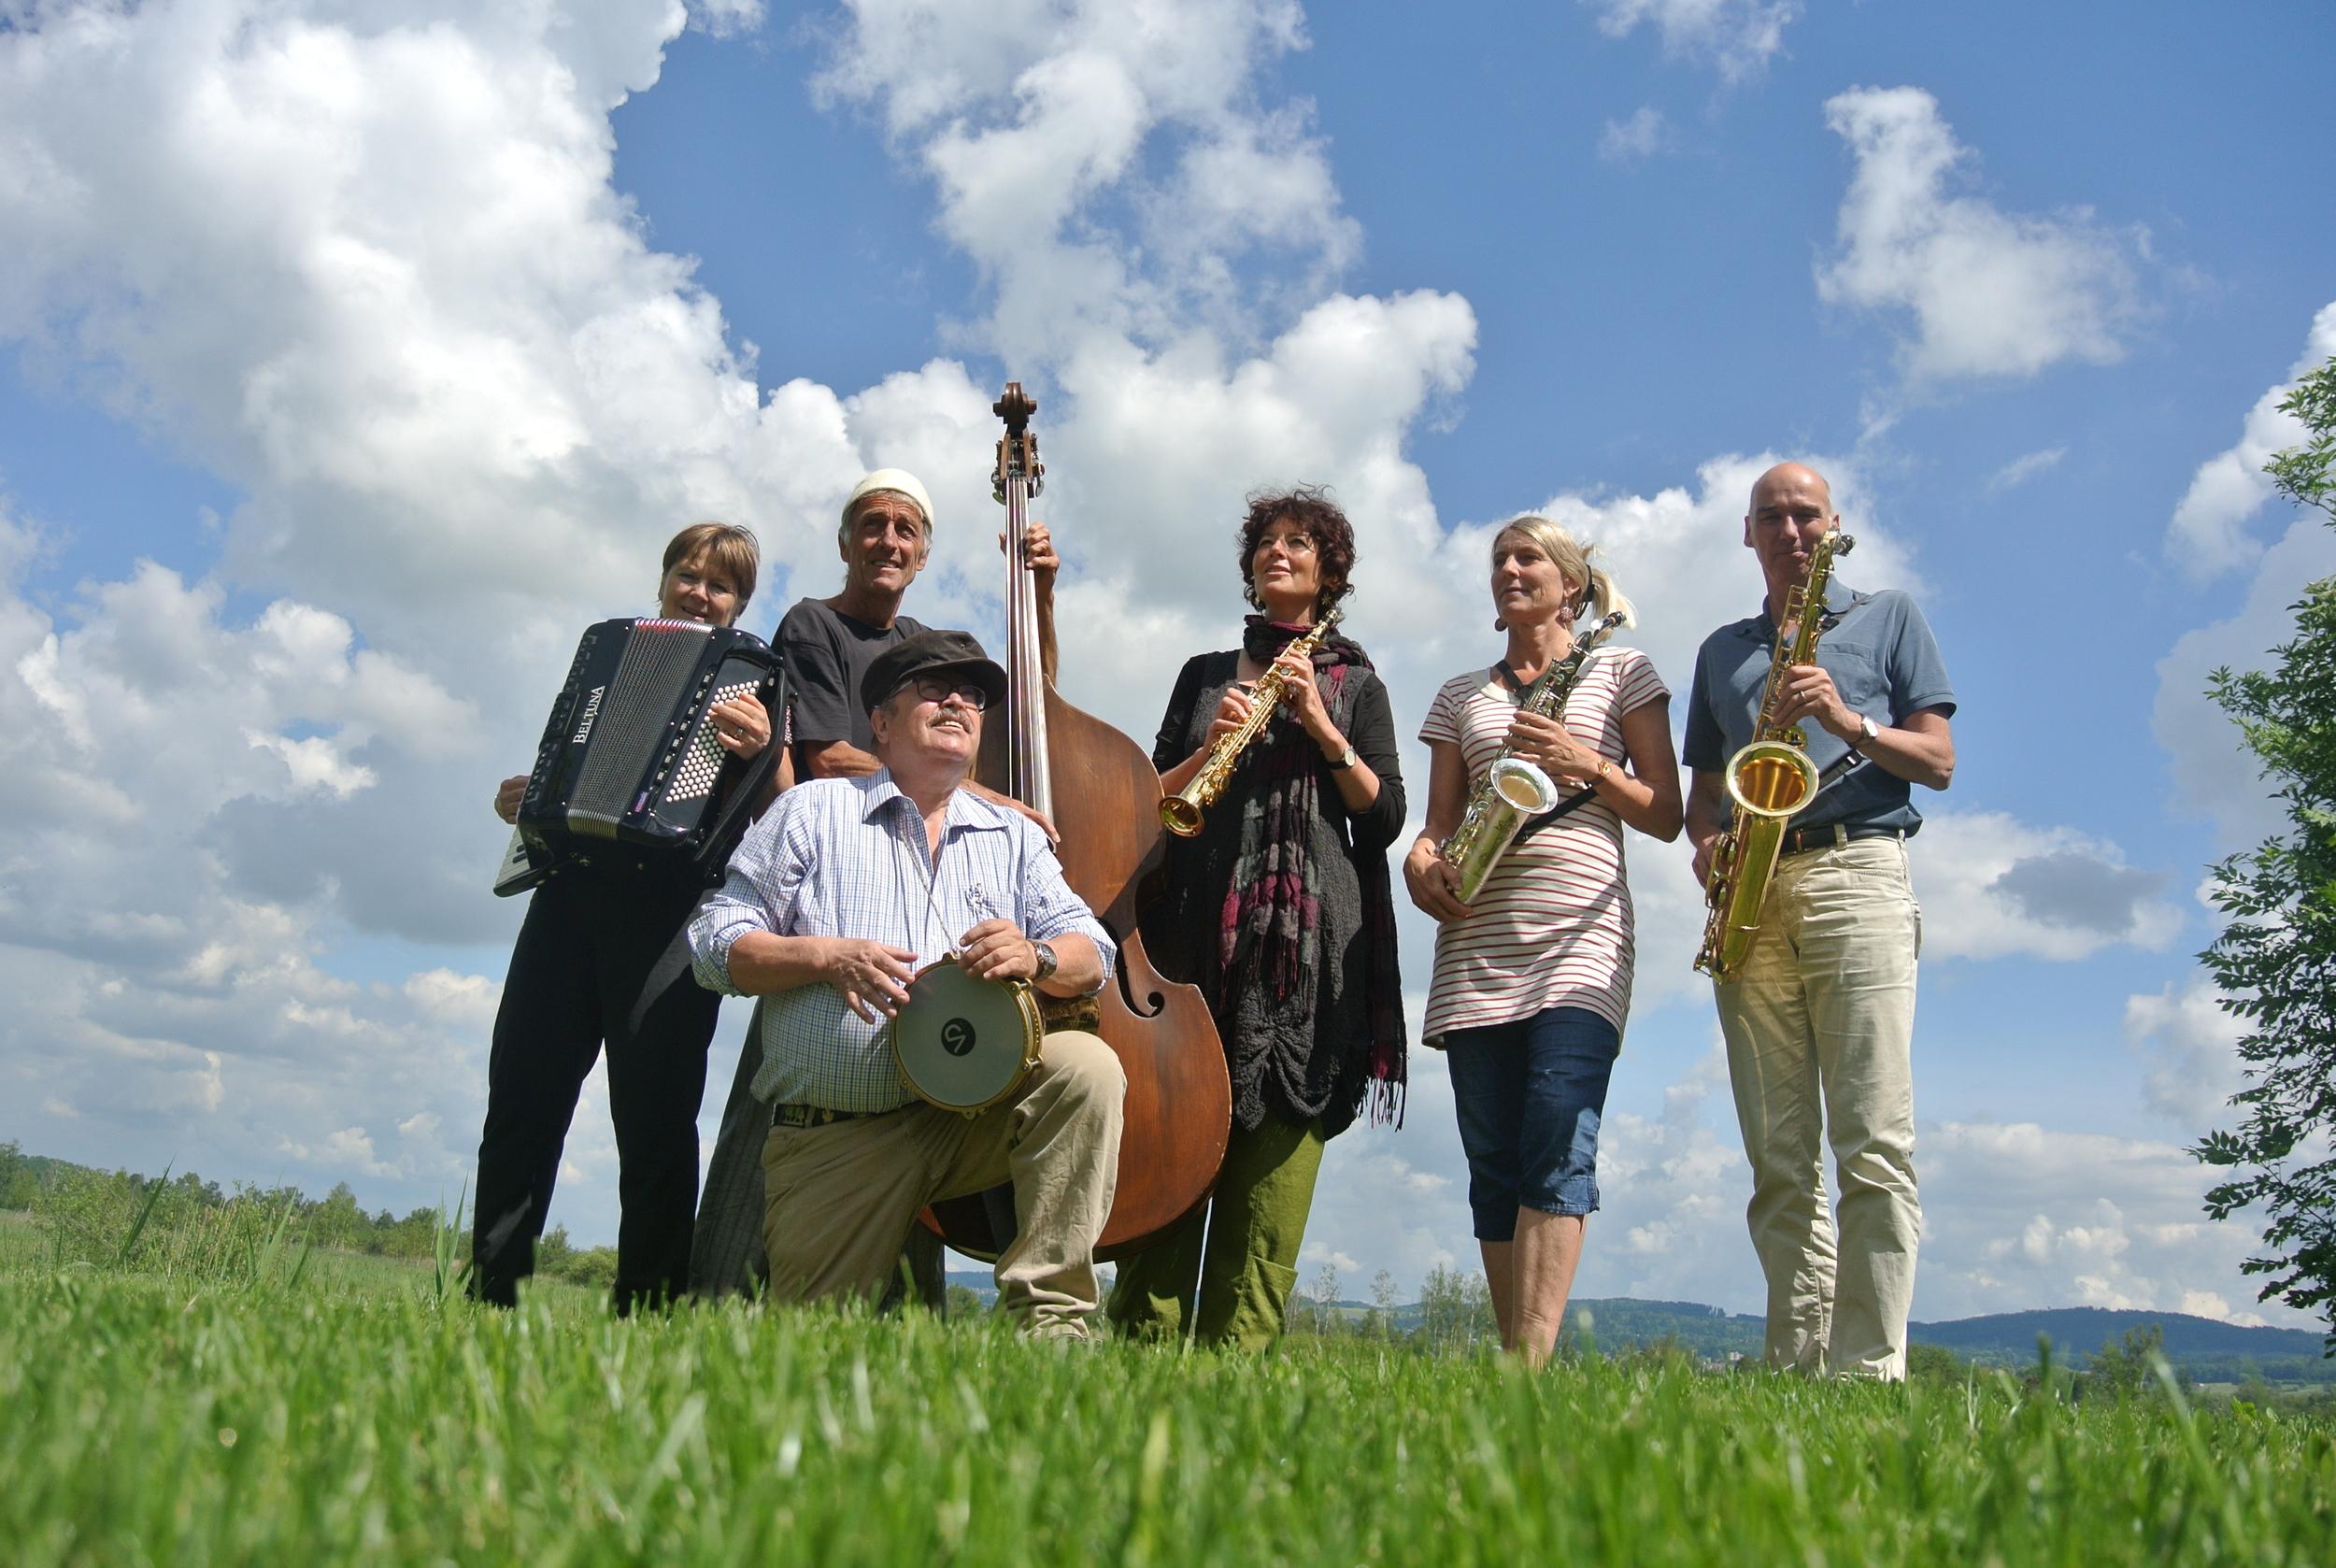 Kafilutz (v.l.n.r.): Eva Pieth, Lucius Sigrist, Sigi Nagel, Barbara Camenzind, Doris Hertig und Andi Lutz